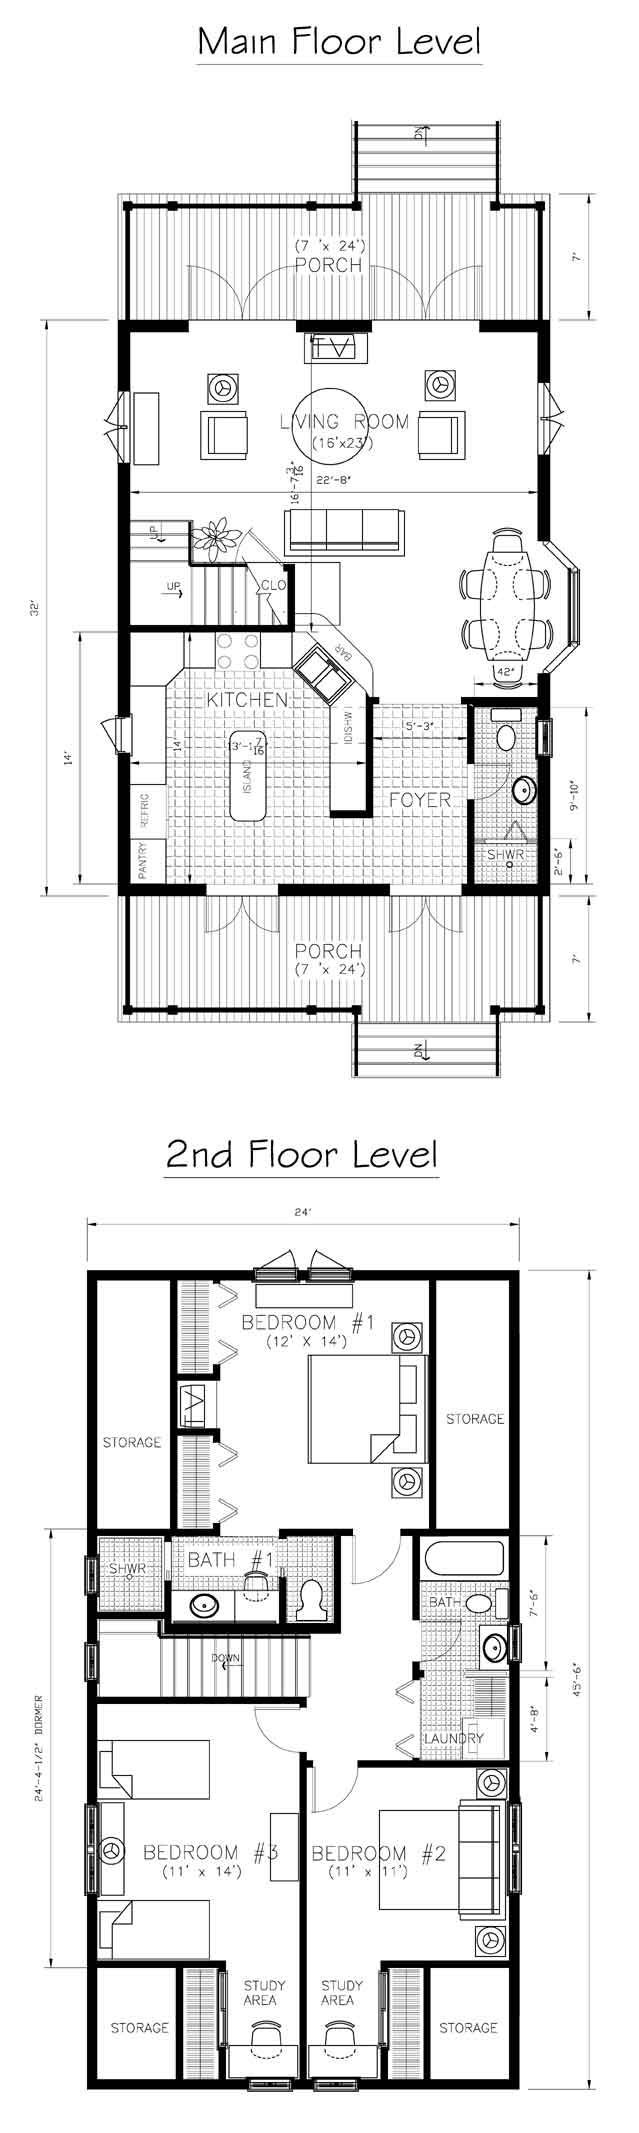 3 master bedroom house plans  FlrPln House Cottage Plans  Floor Plans  Pinterest  House